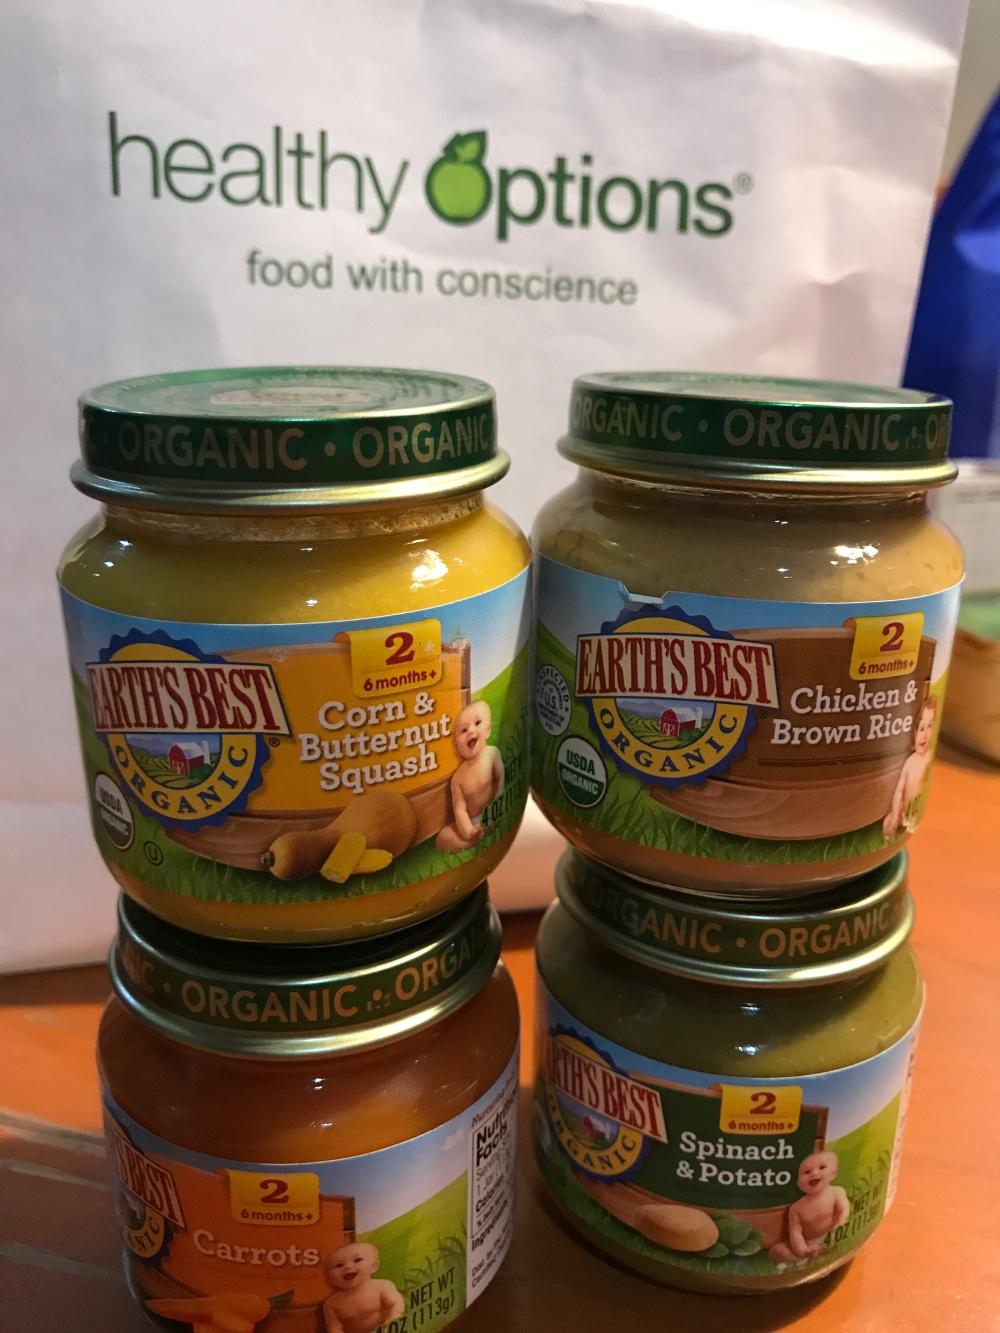 healthy options, earth's best baby food, jarred baby food